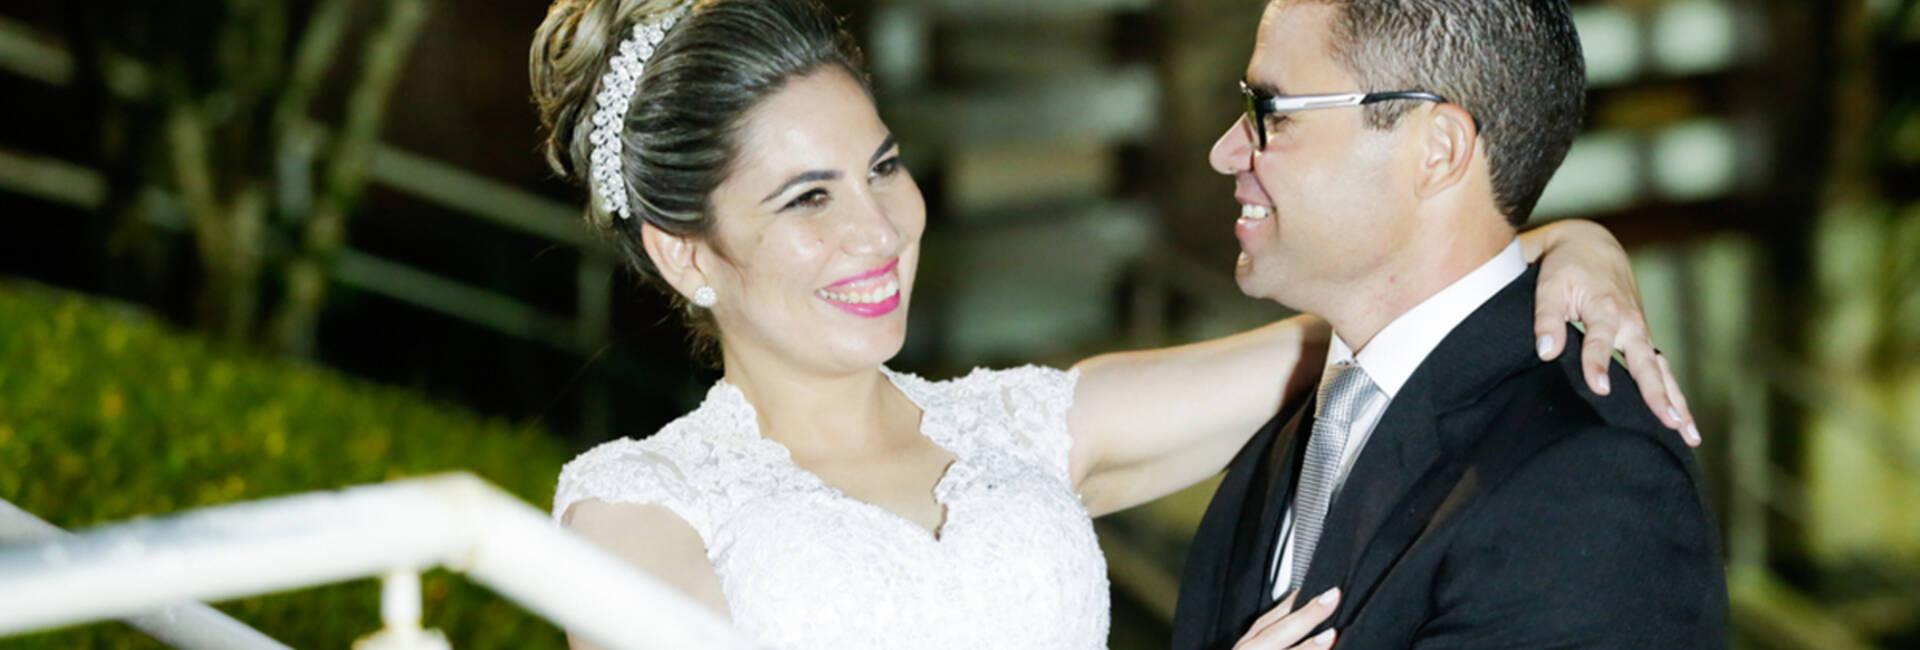 Casamentos de Erika & Levi